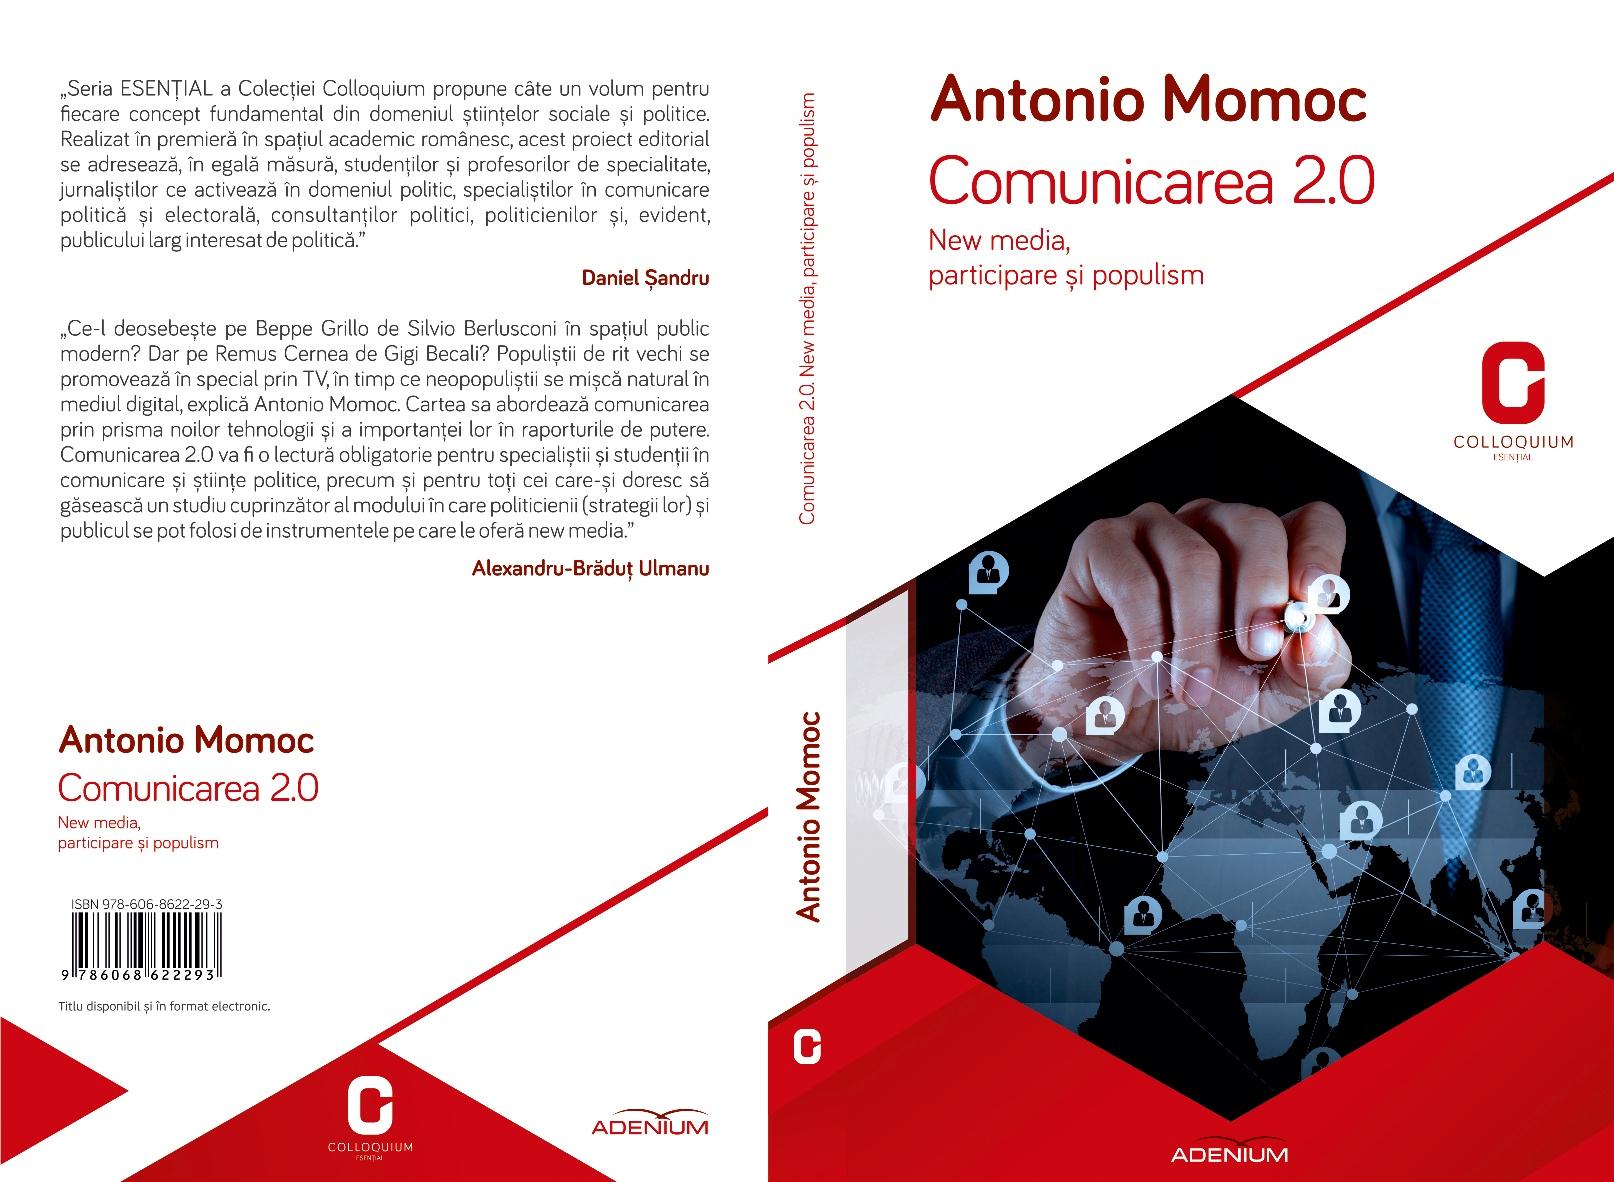 Comunicarea 2.0.  New media, cyber-democrație sau cyber-balcanism?